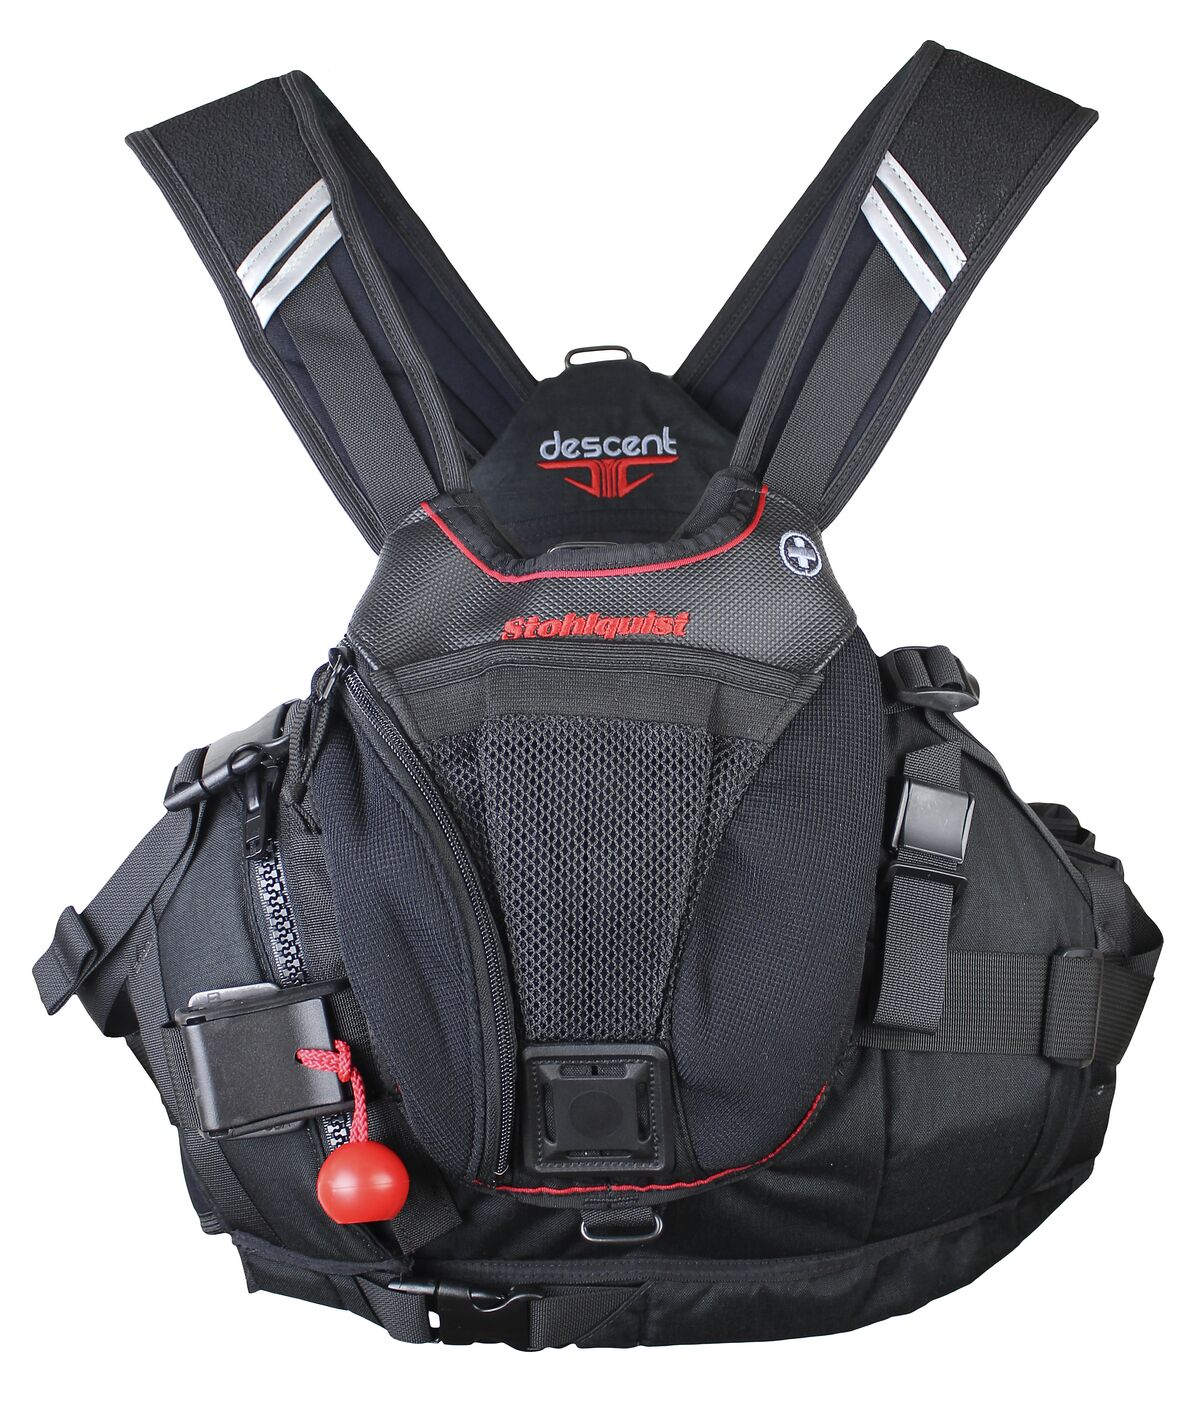 Stohlquist  Descent Type-V Strong Swimmer Safety Vest